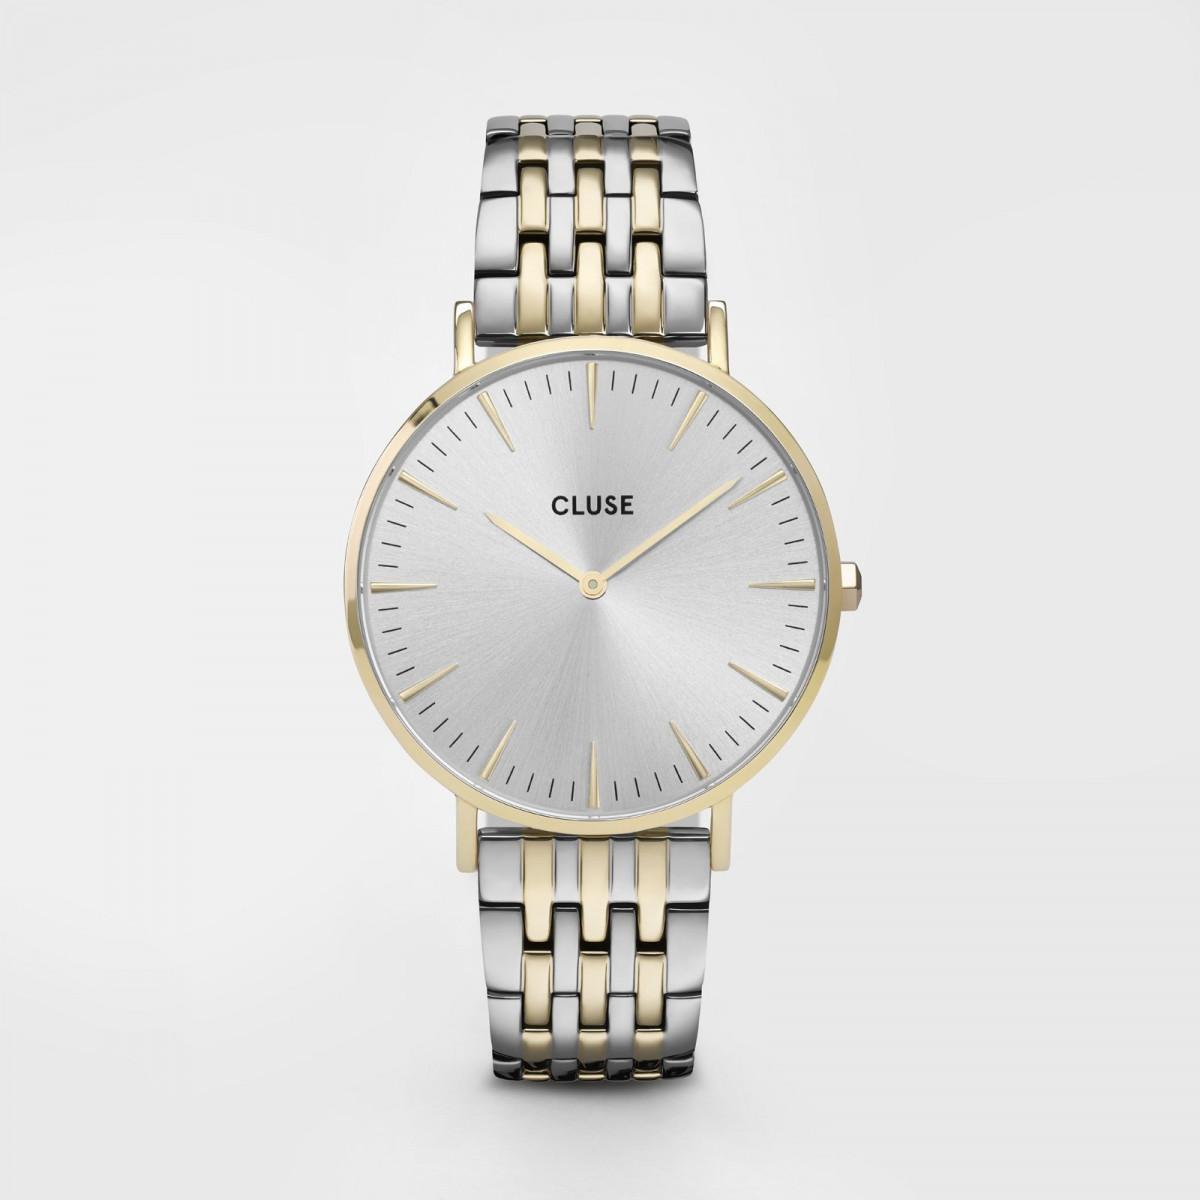 cluse-la-boheme-cw0101210025-gold-silver-n-i-karora_d35f5575159da4399f7efb2094ec9d5e.jpg